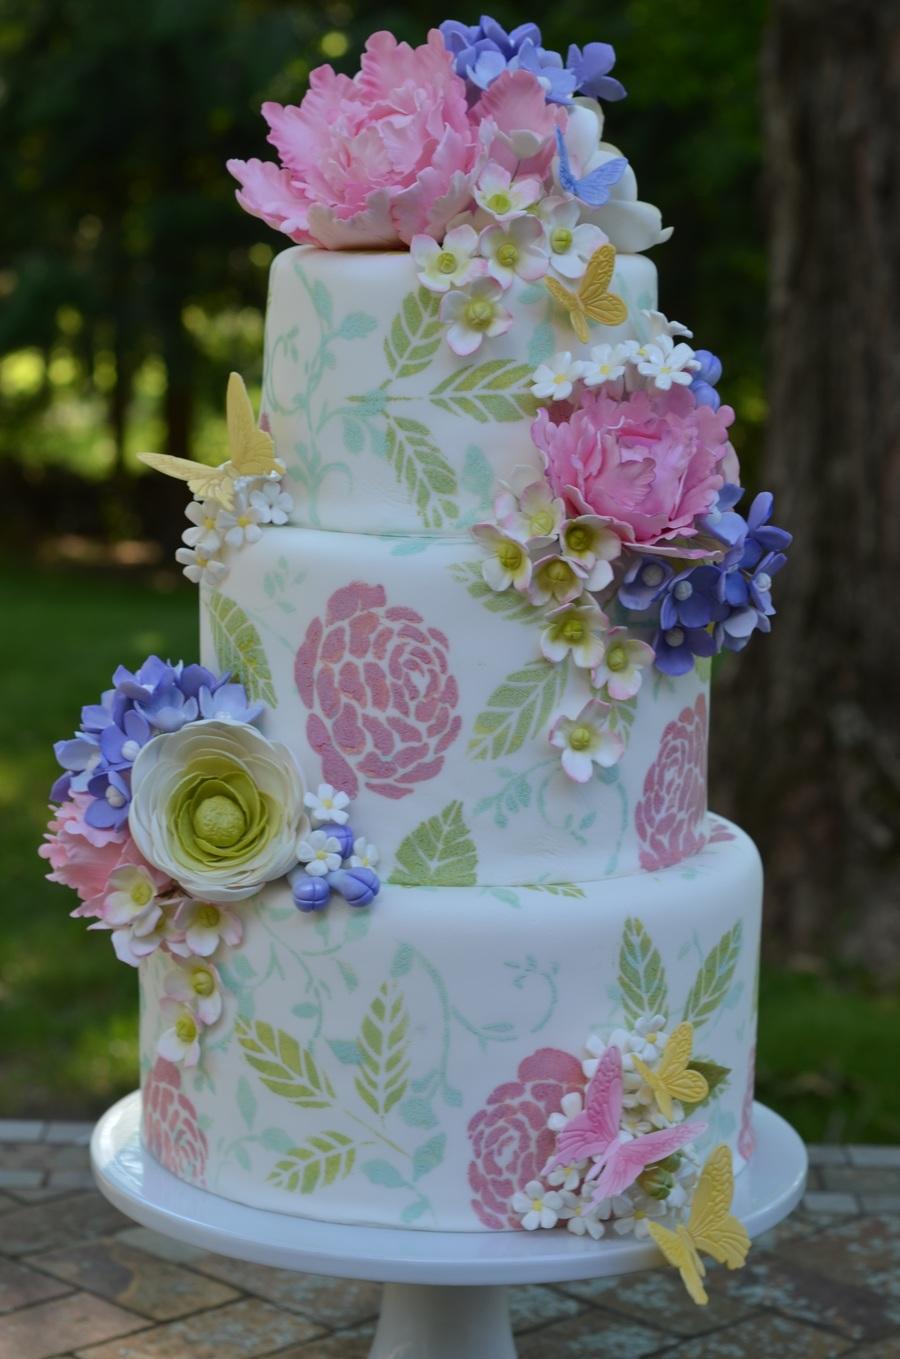 Garden Wedding Cake With Gumpaste Flowers - CakeCentral.com